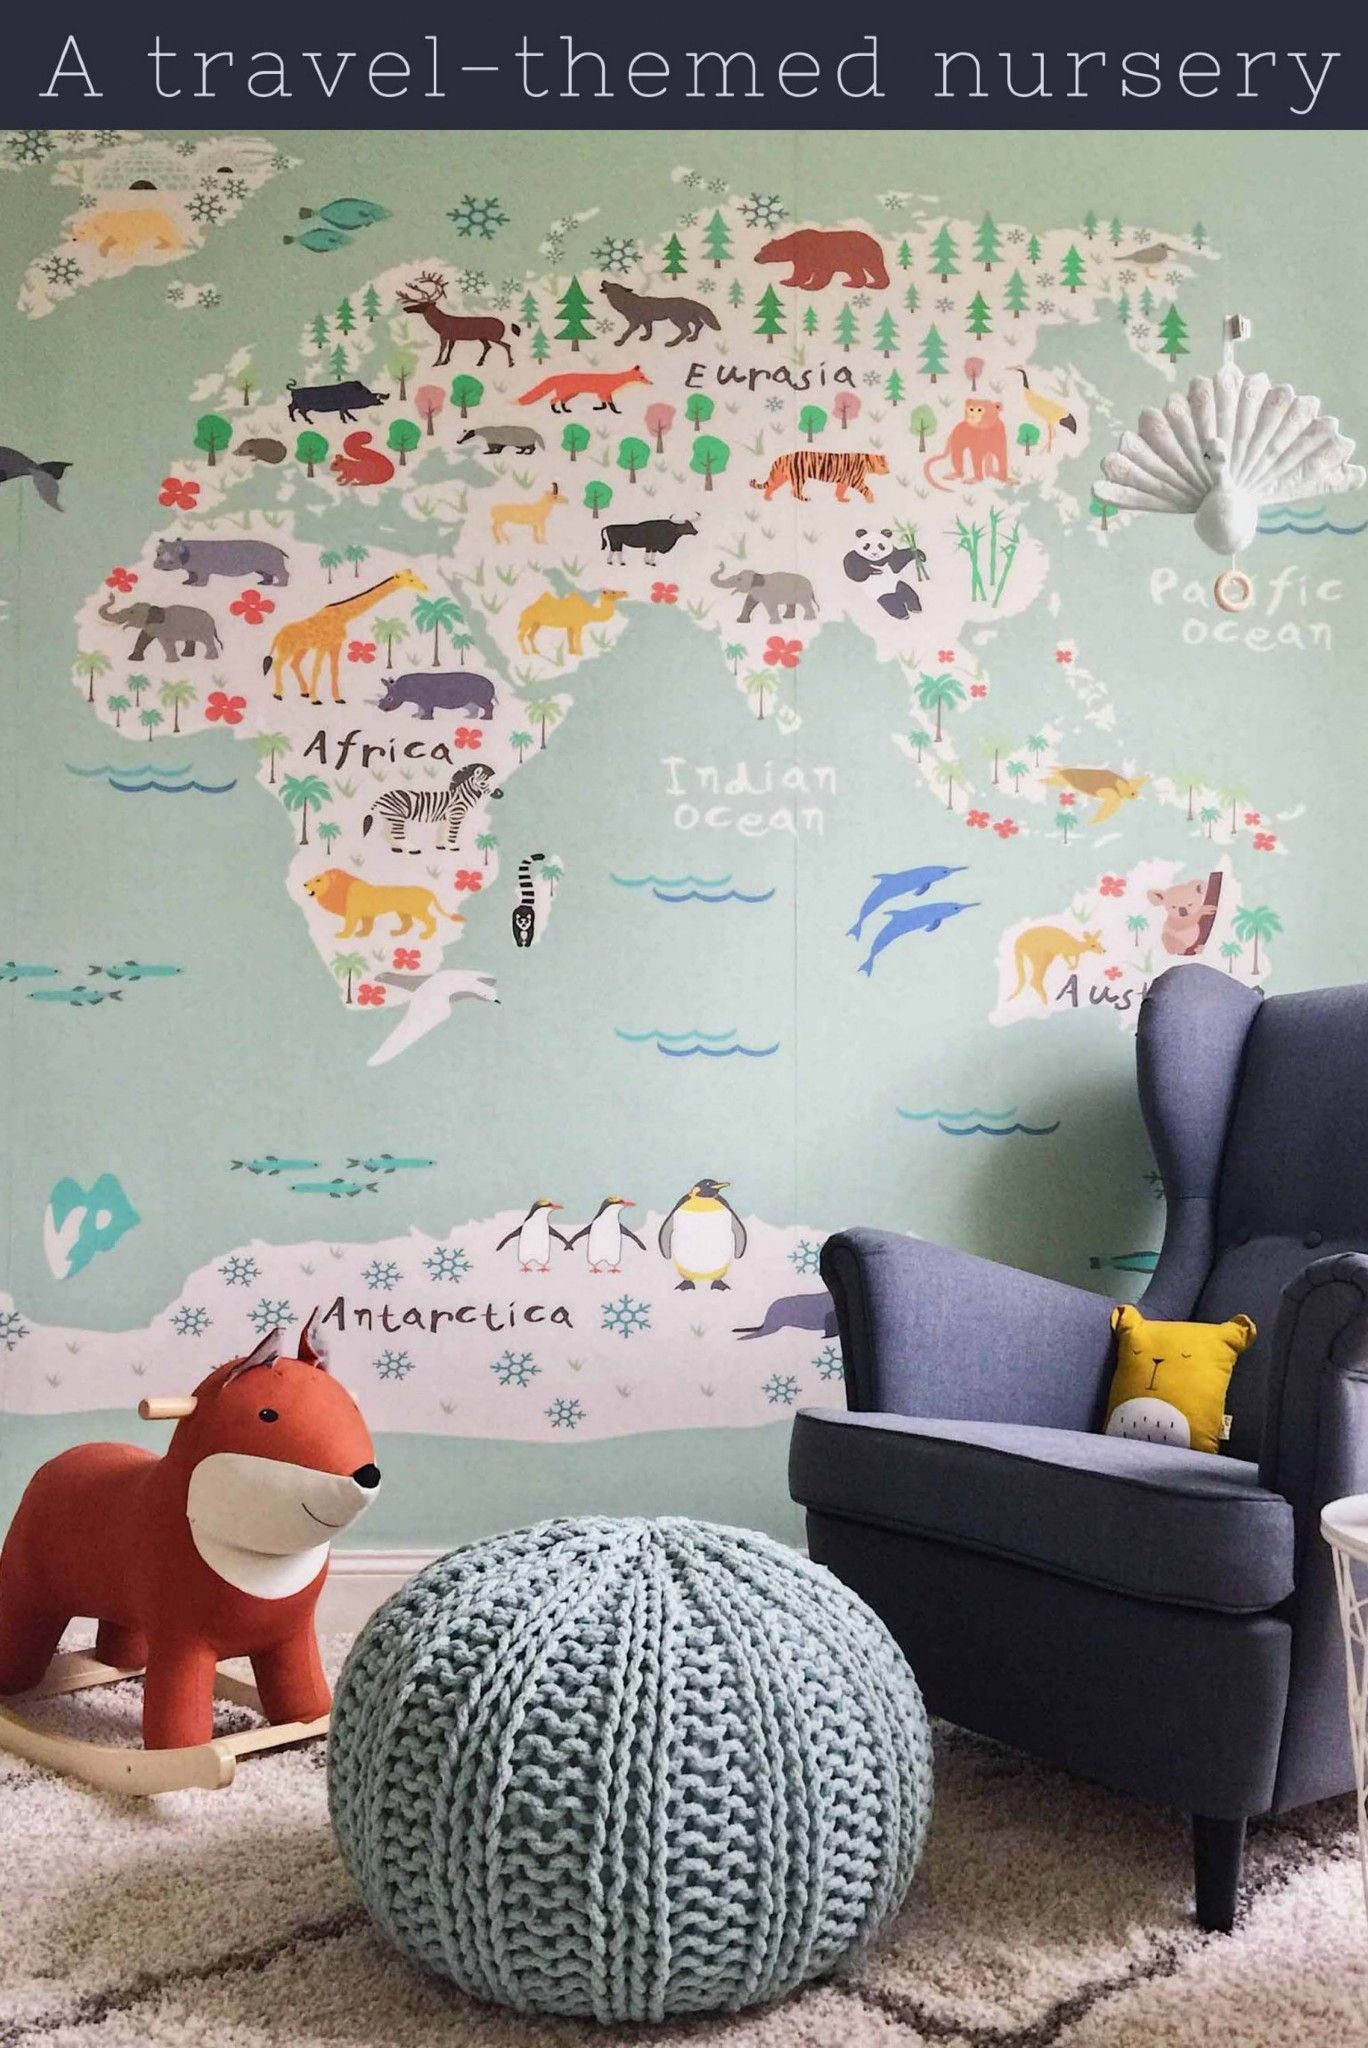 travel themed nursery   future baby   pinterest   nursery themes